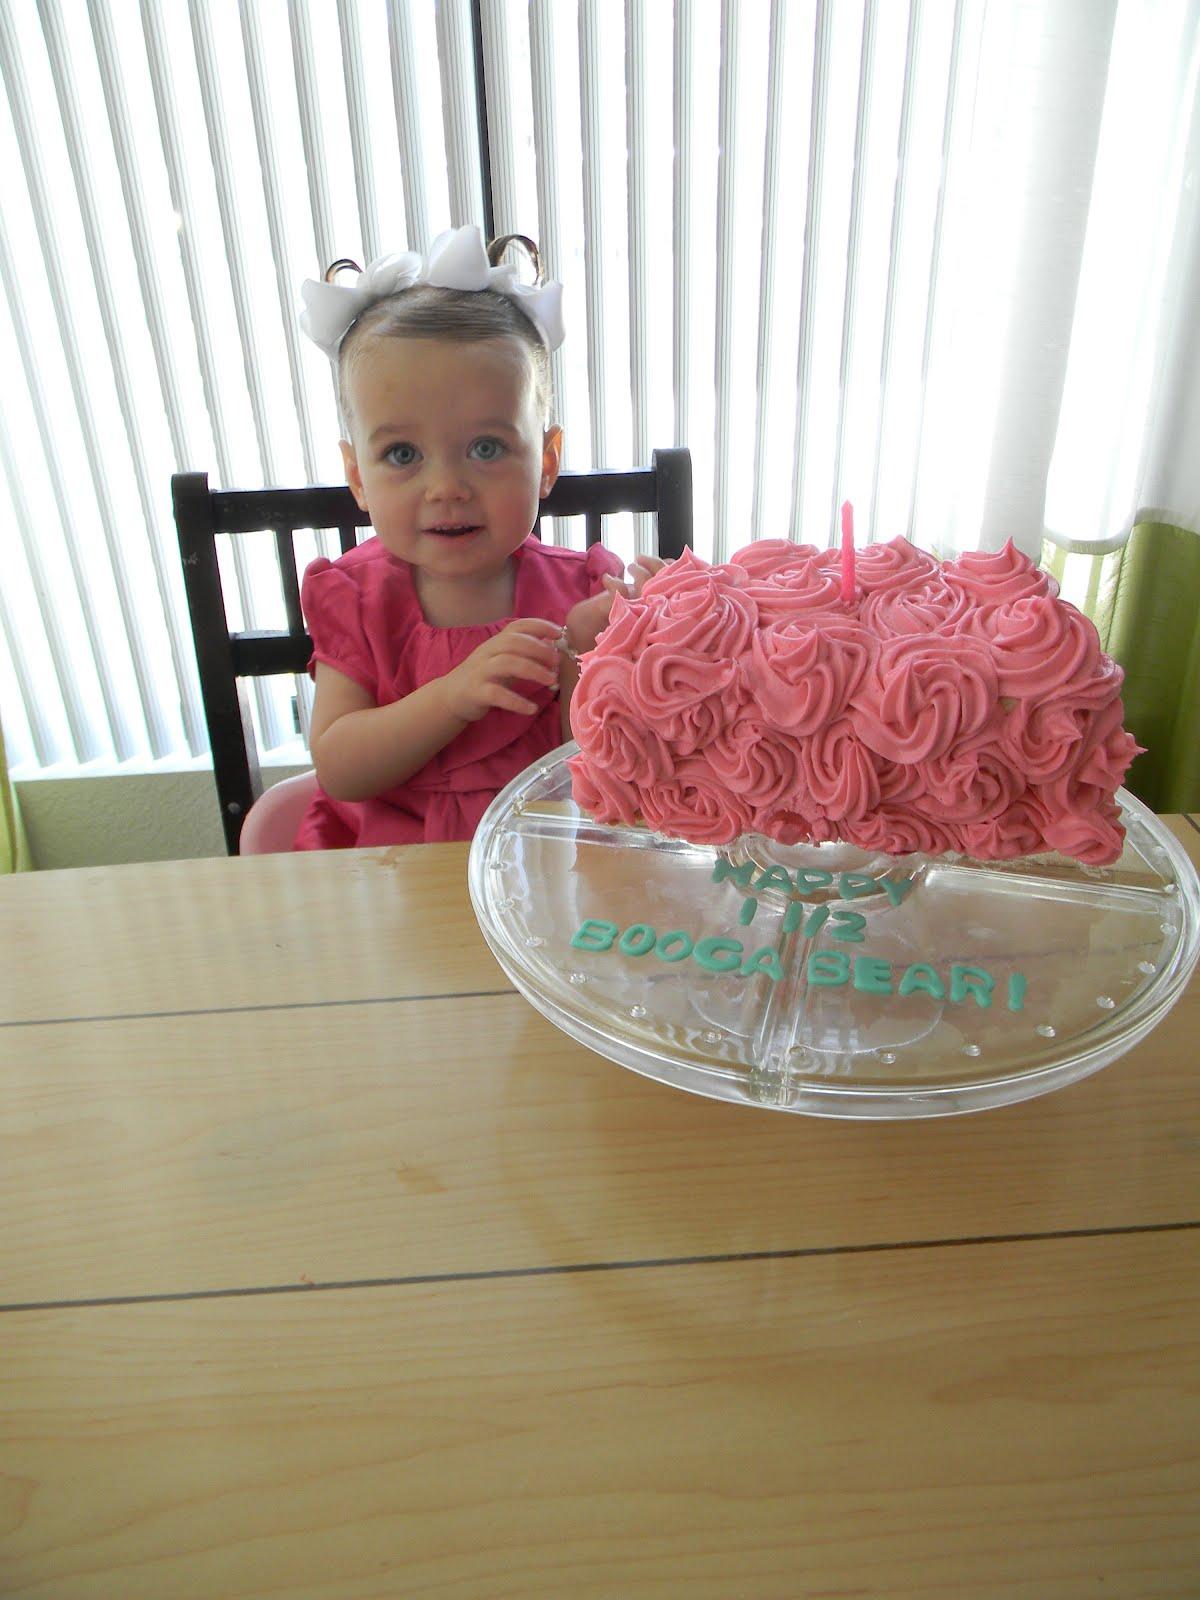 Jesicakes Rosette Half Birthday Cake